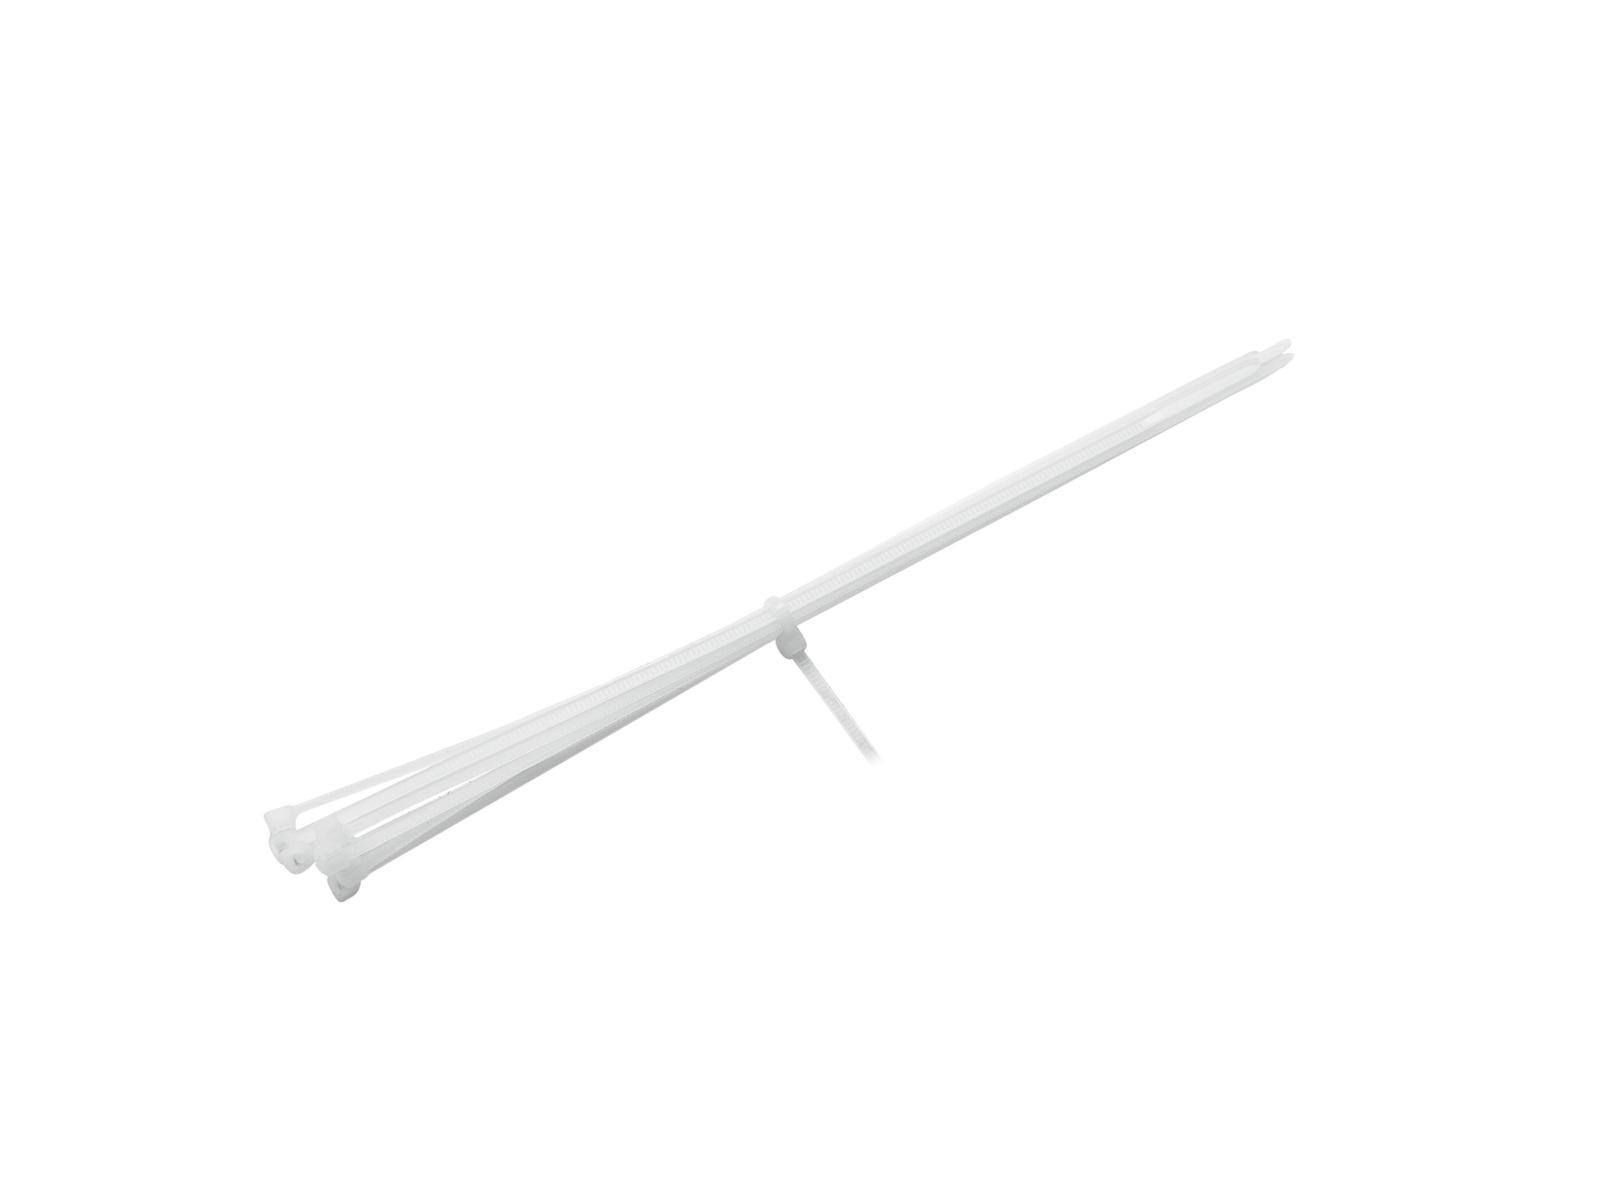 EUROLITE Cavo cravatta 200x2.5mm bianco 100x